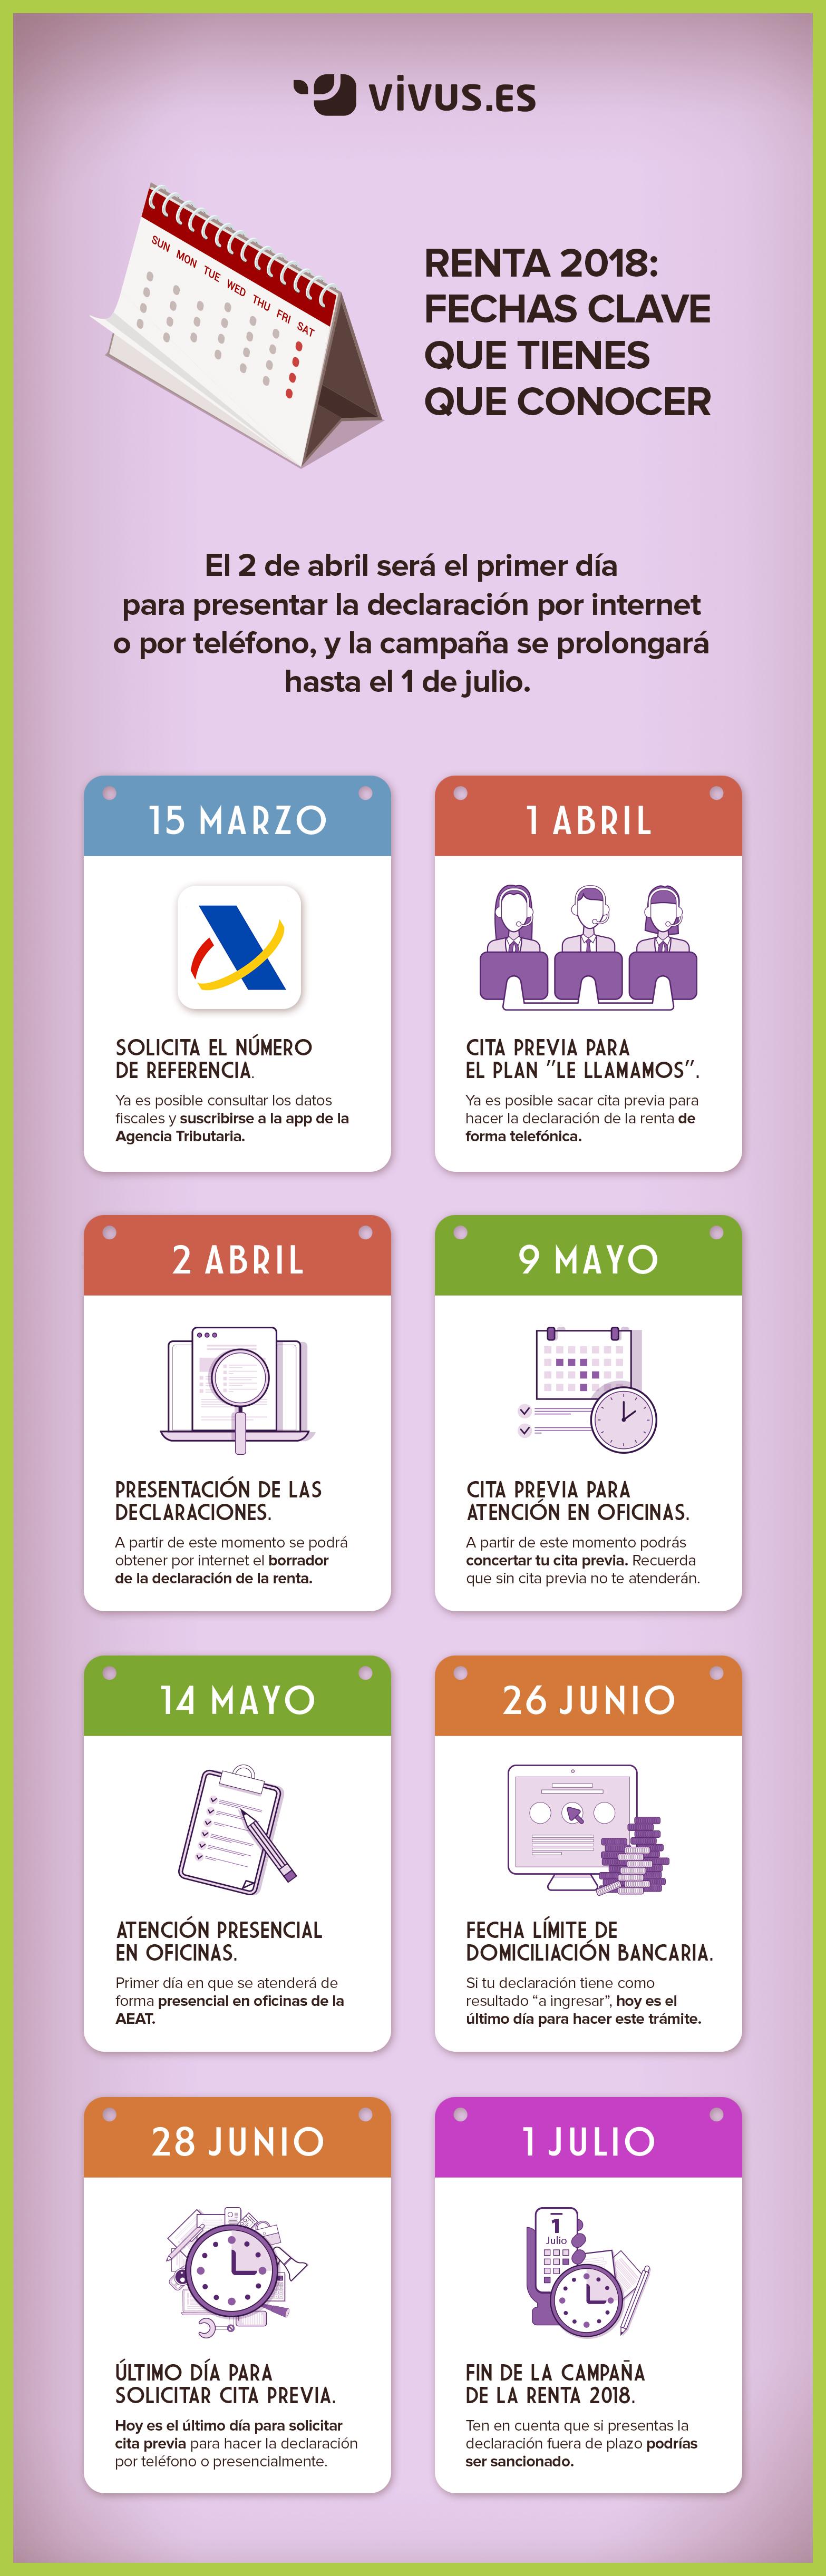 infografia-renta 2018